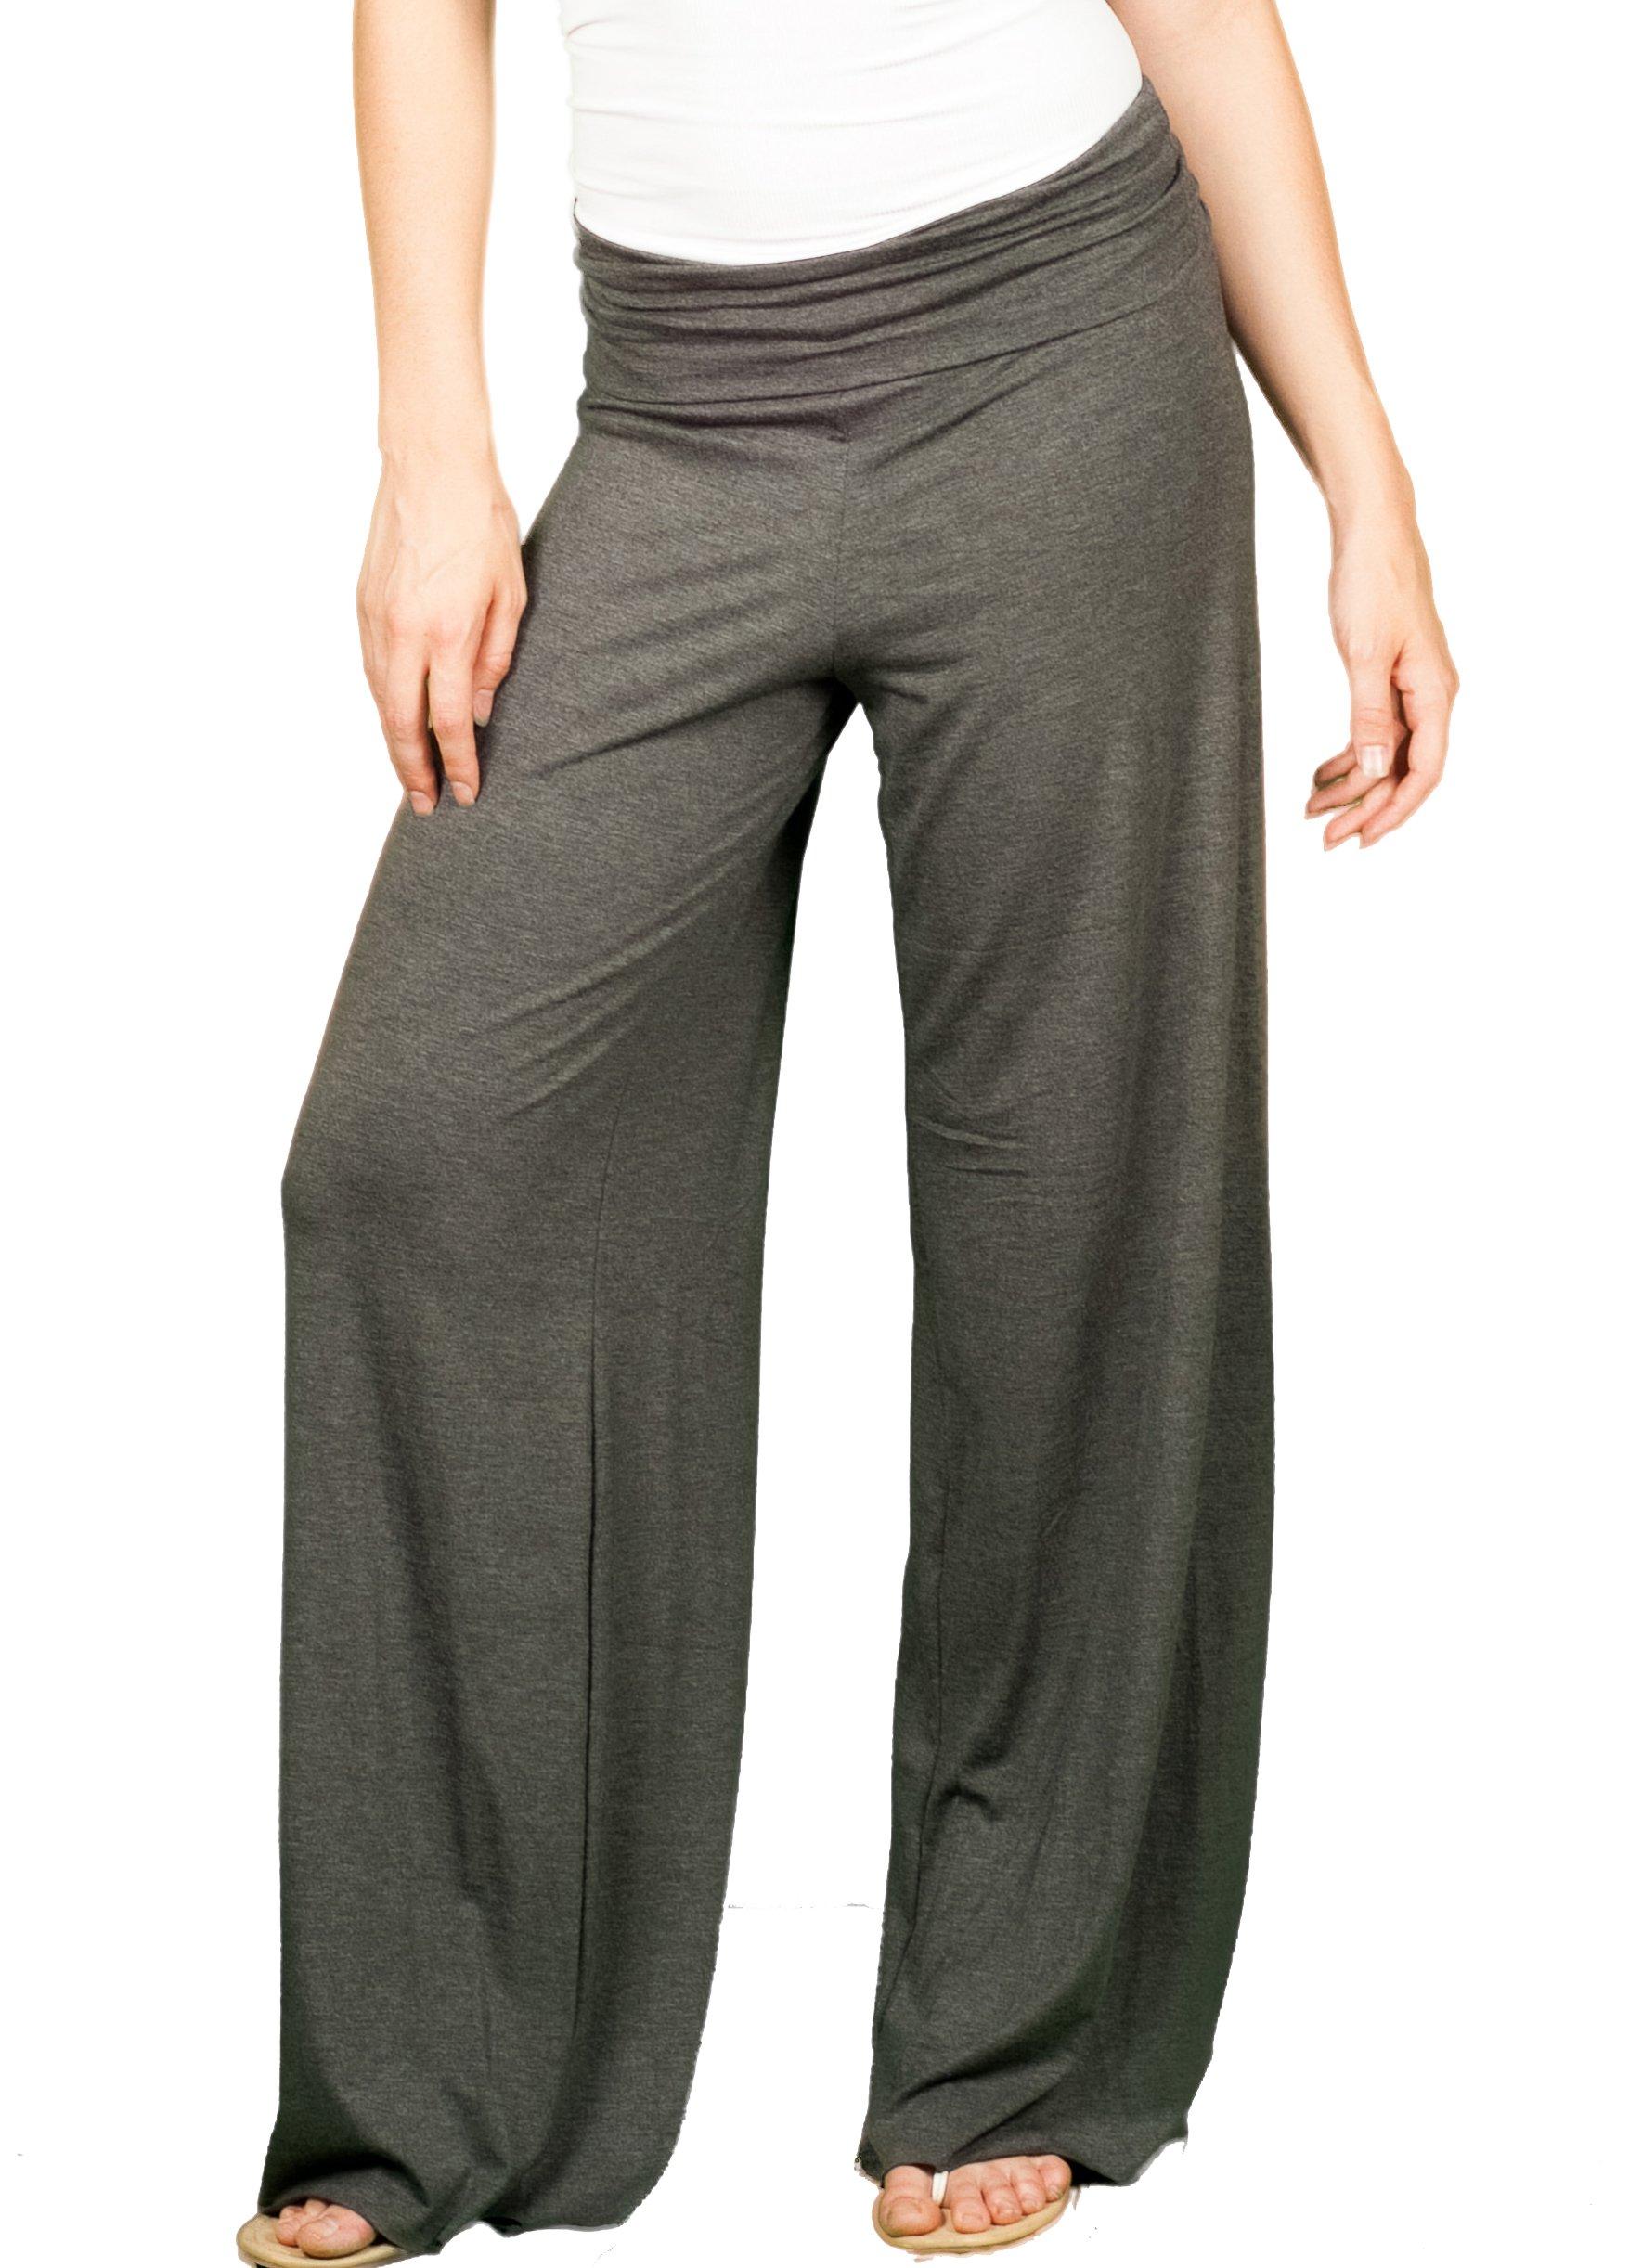 TL Women's Made in USA Comfy Wide Leg Long Boho Maternity Palazzo Gaucho Pants CHARCOAL, Large